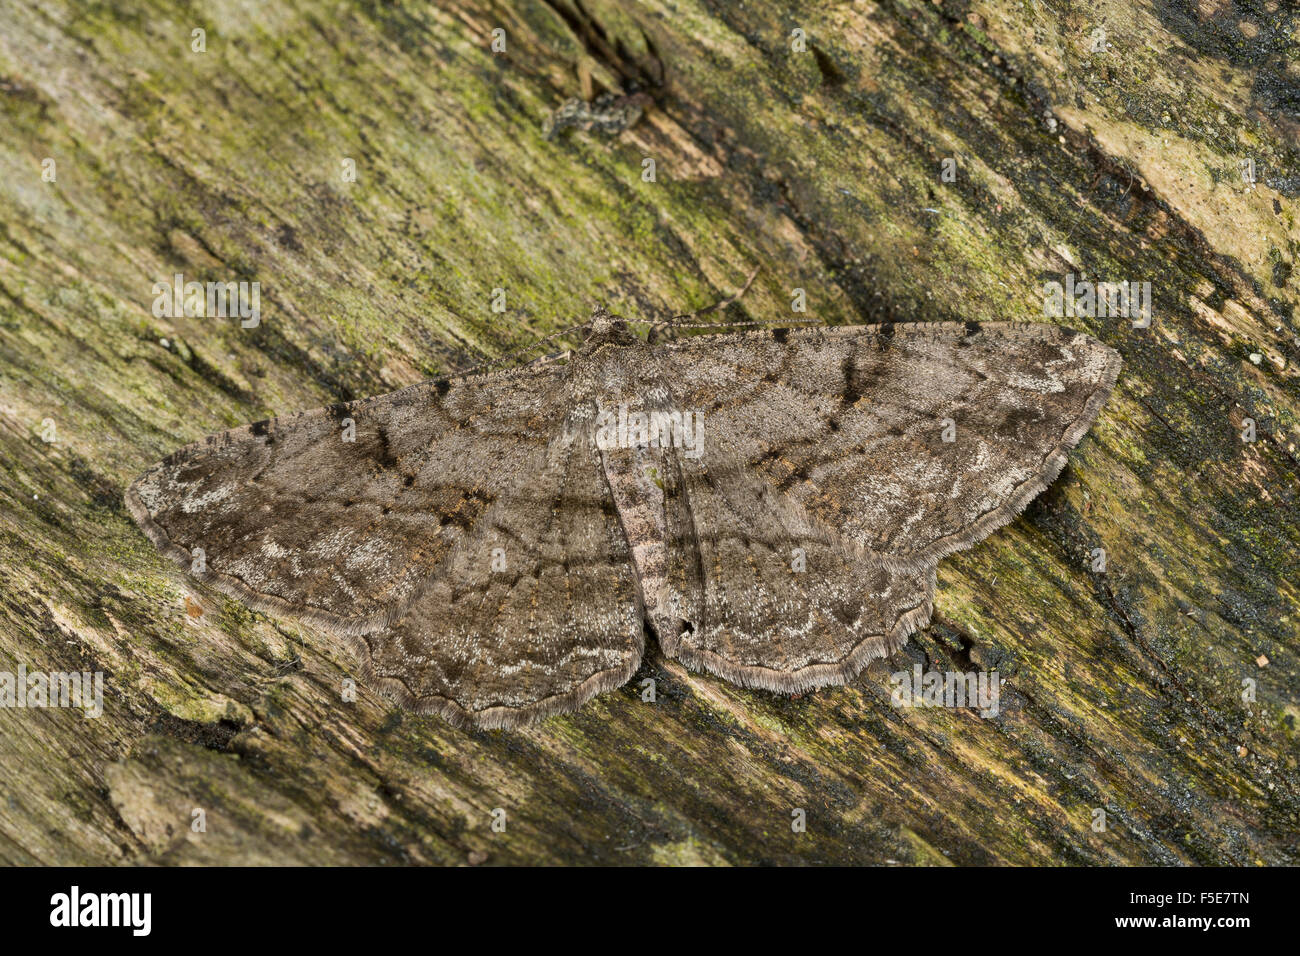 Willow Beauty, Rauten-Rindenspanner, Rhombenspanner, Peribatodes rhomboidaria, Boarmia defloraria, Boarmia syritaurica, - Stock Image